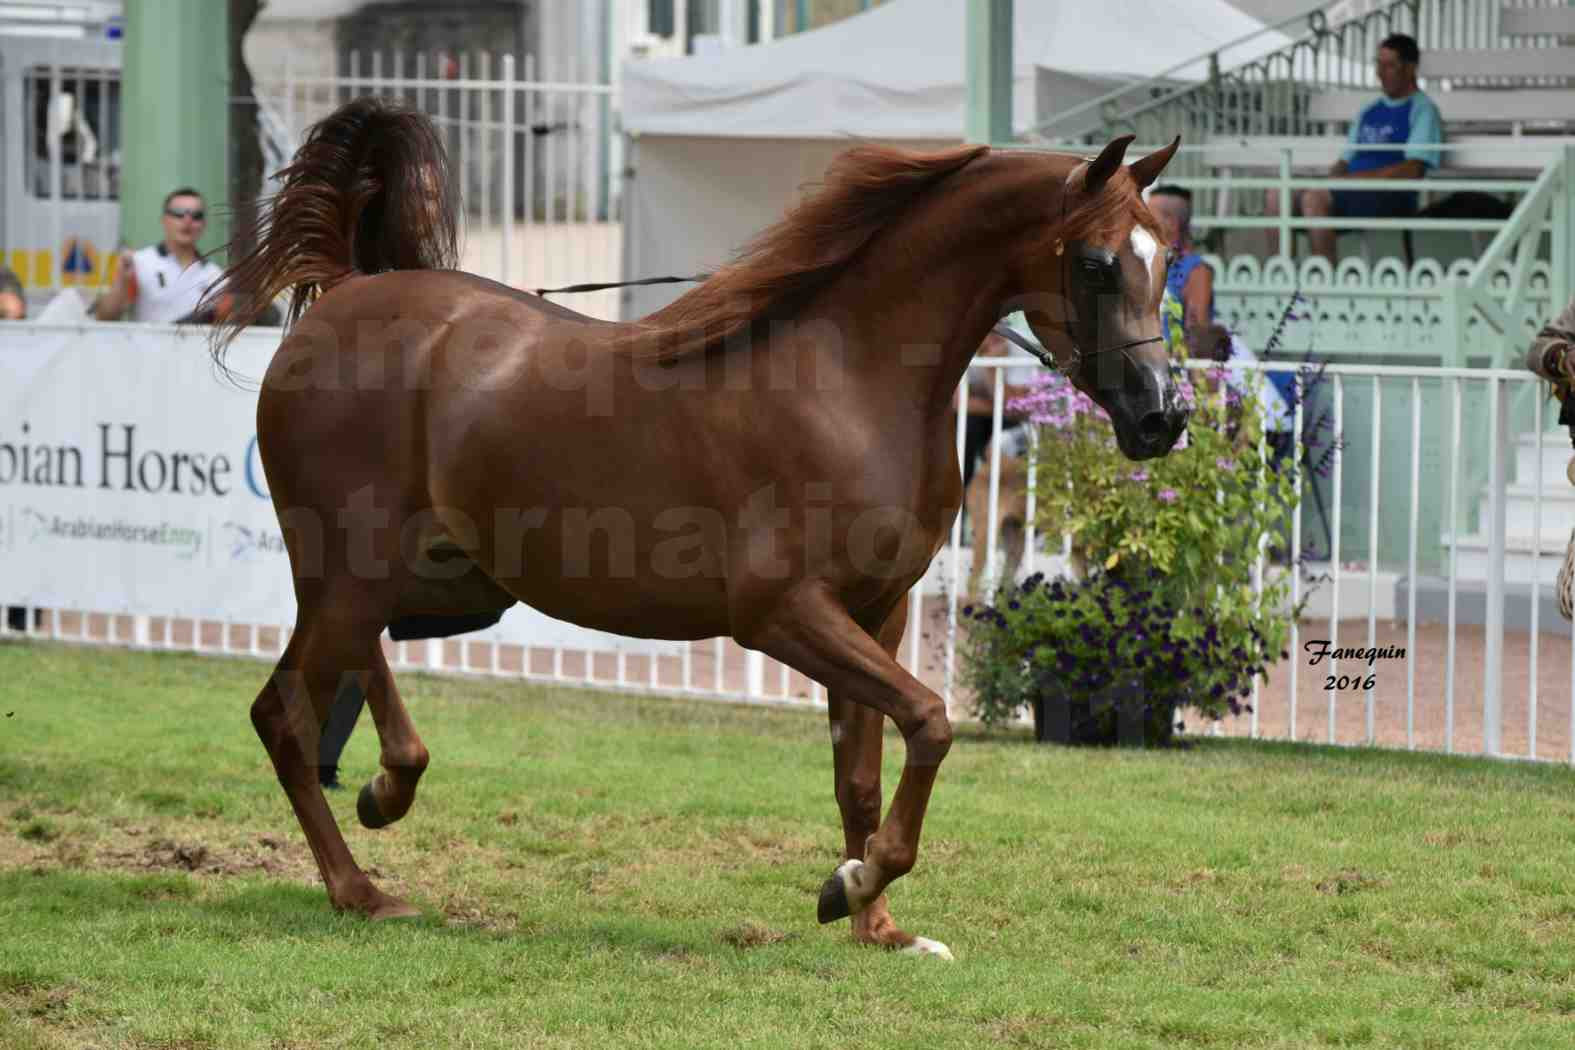 International Arabian Horse Show B de VICHY 2016 - PEARL DE DJOON - Notre Sélection - 28